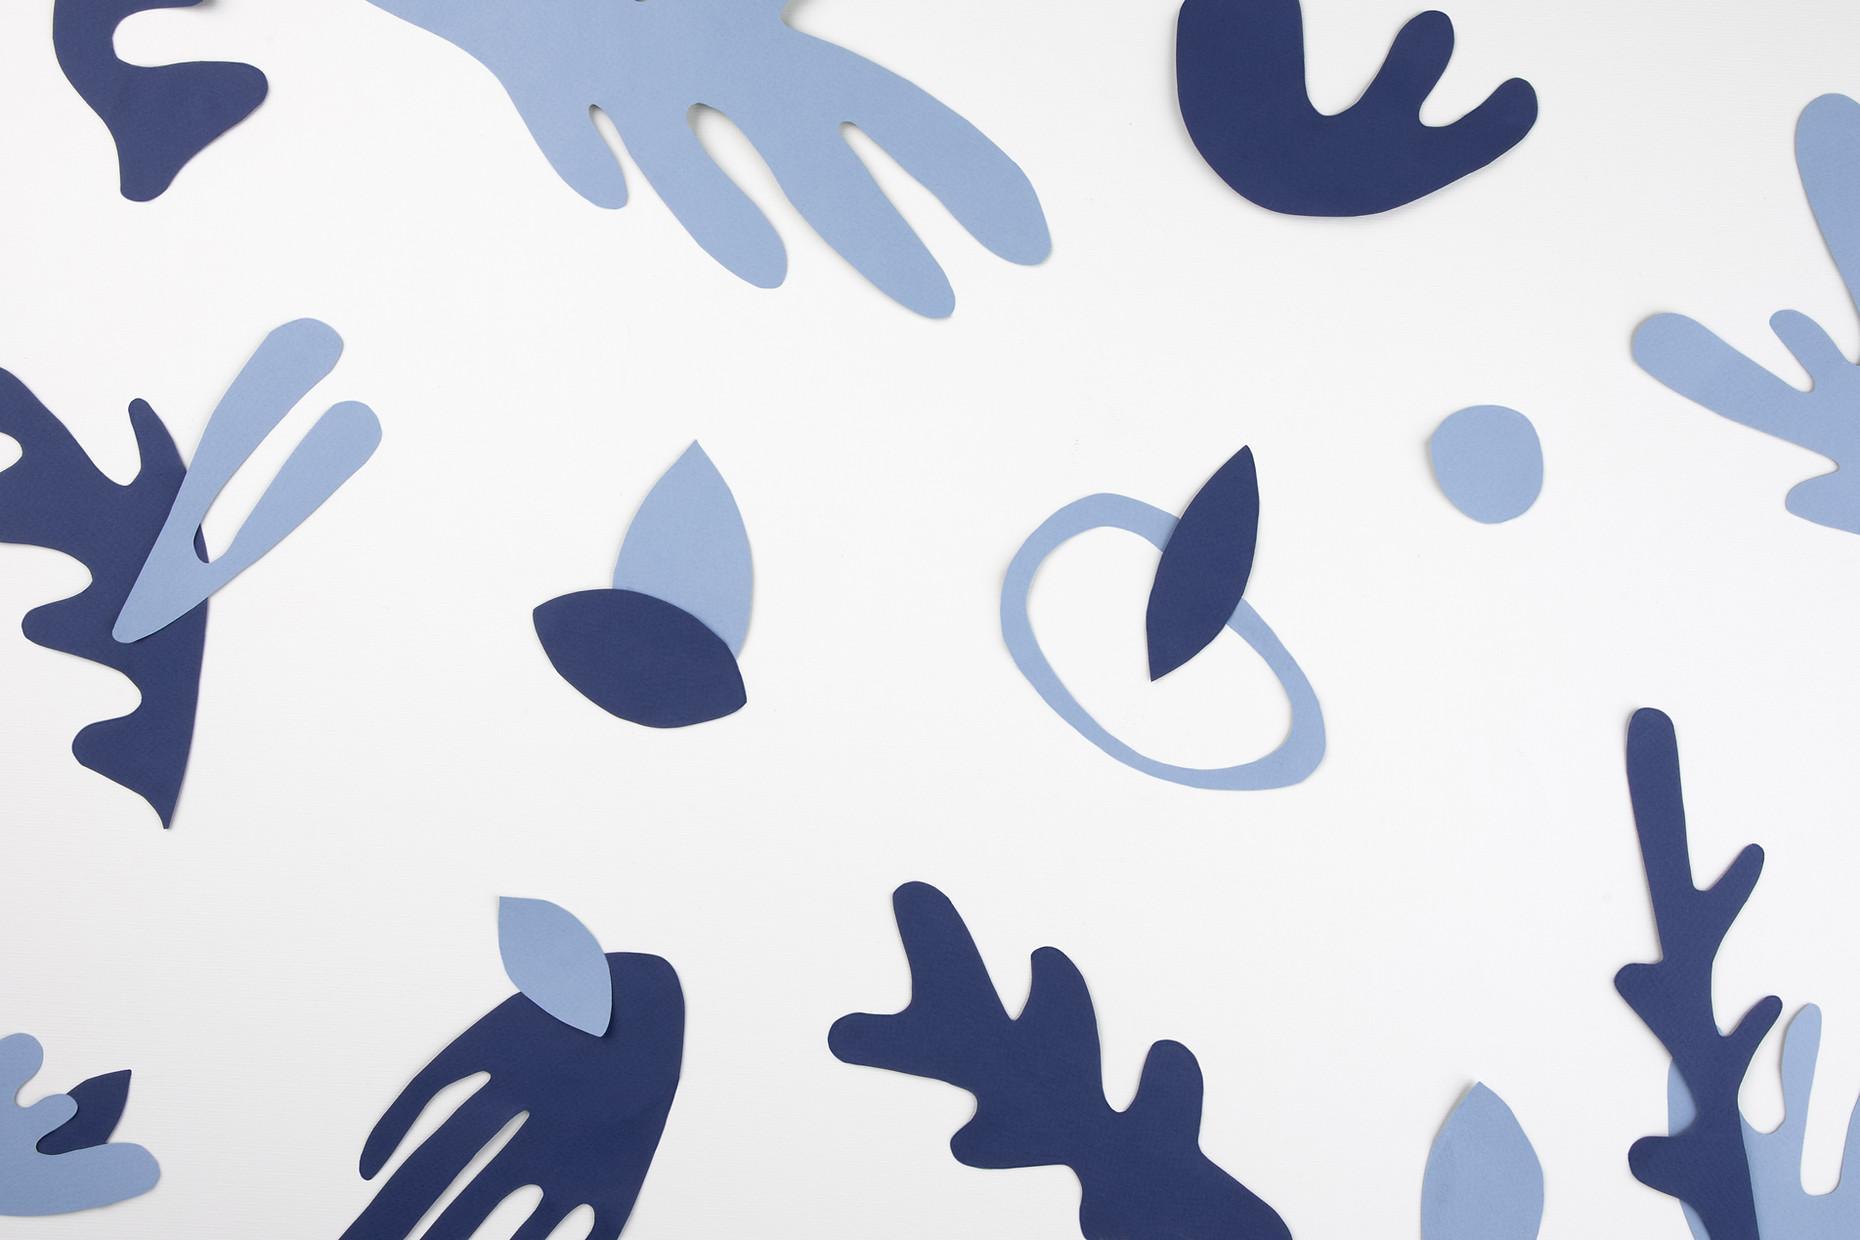 Blue Paper Cutouts